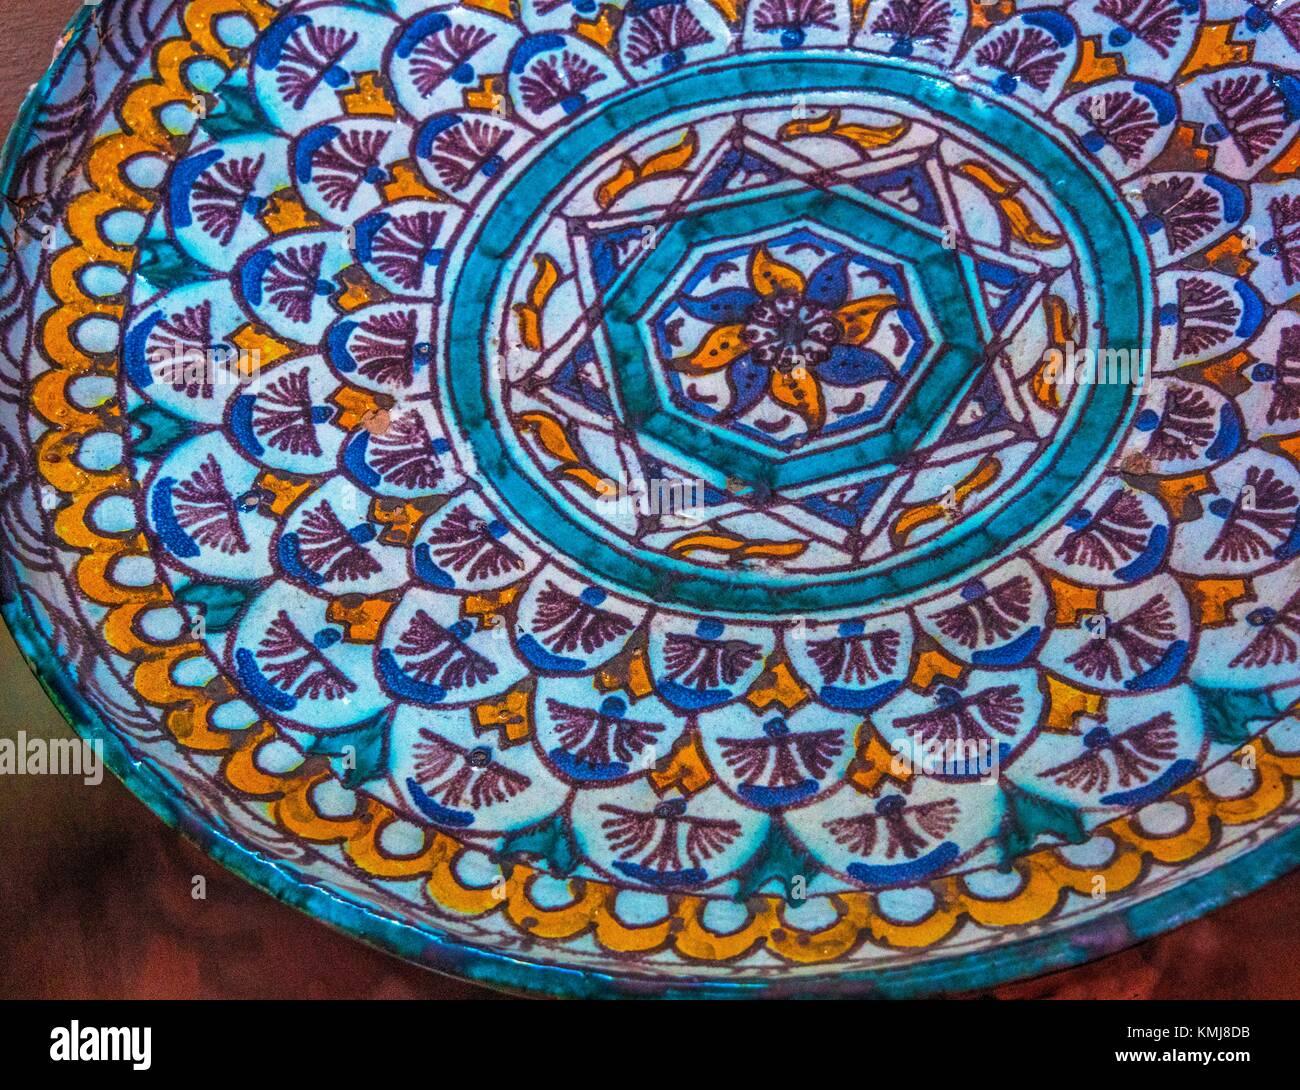 Morocco, Meknes, Dar Jamaï Museum: ceramic plate 'Ghtar' for couscous presentation. XIXc. Meknes. - Stock Image